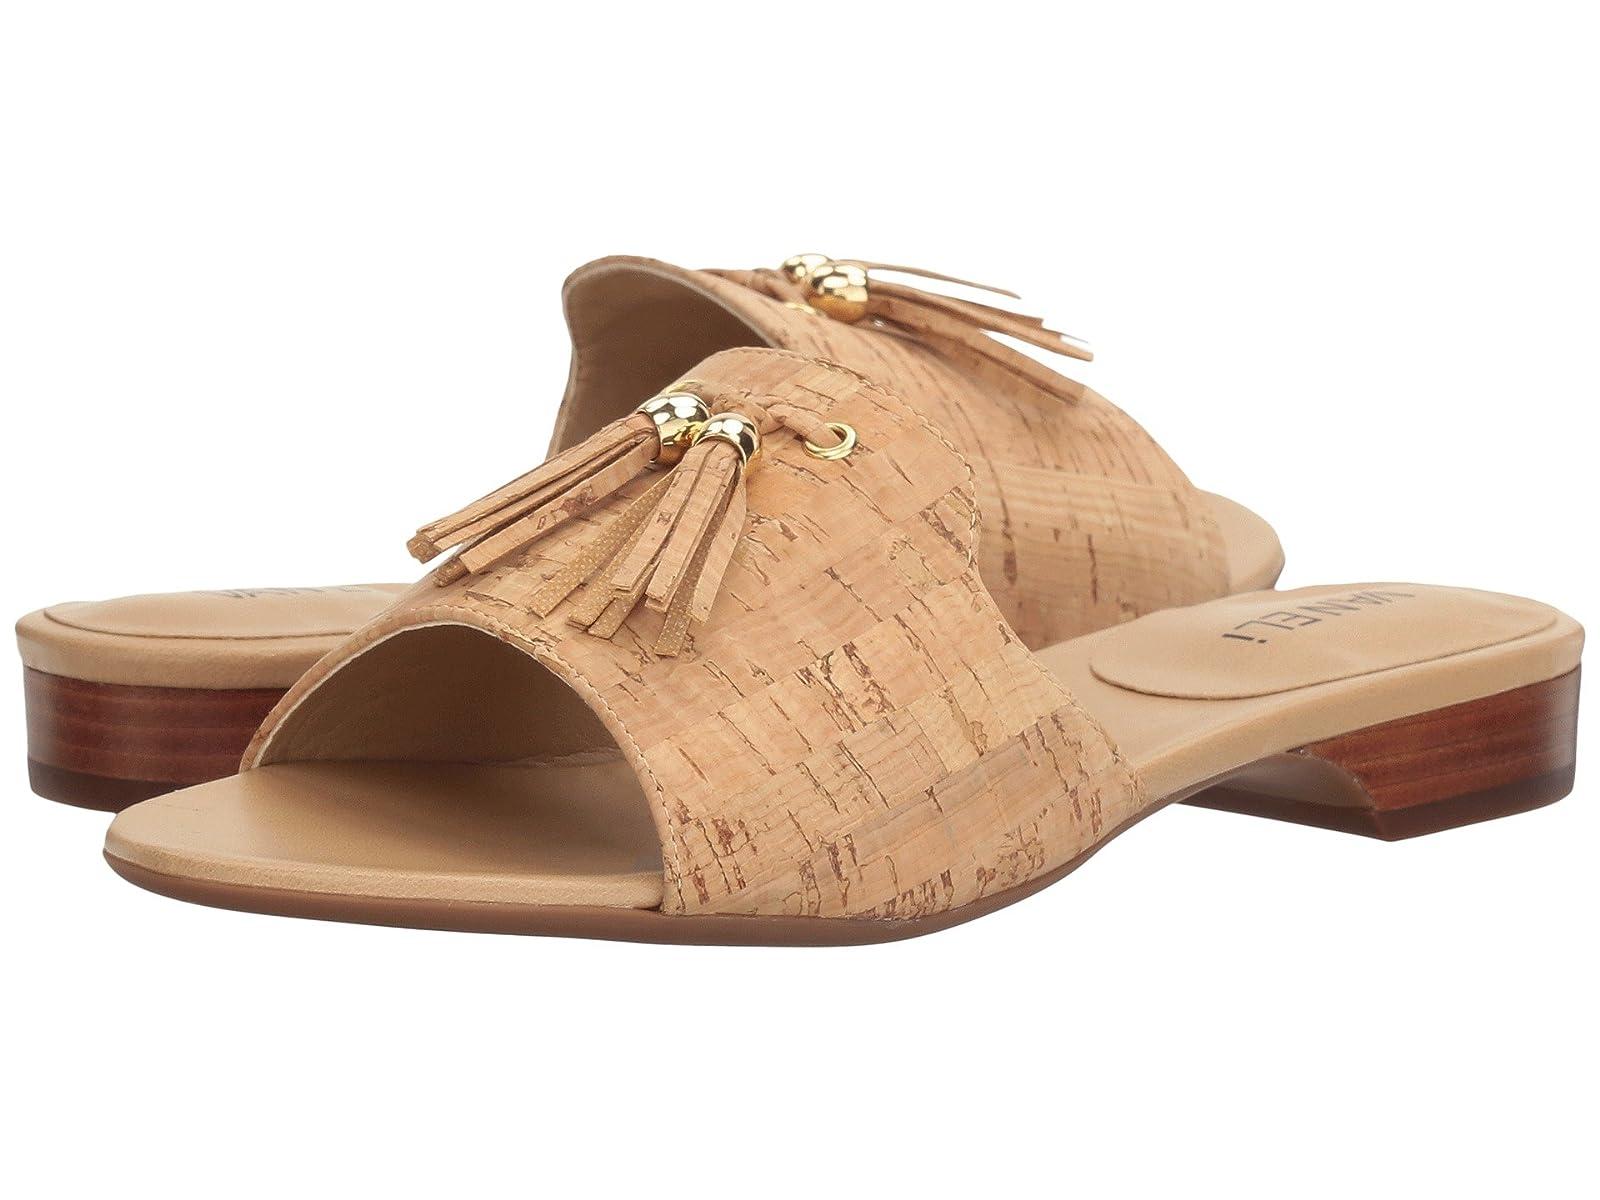 Vaneli BlizziCheap and distinctive eye-catching shoes